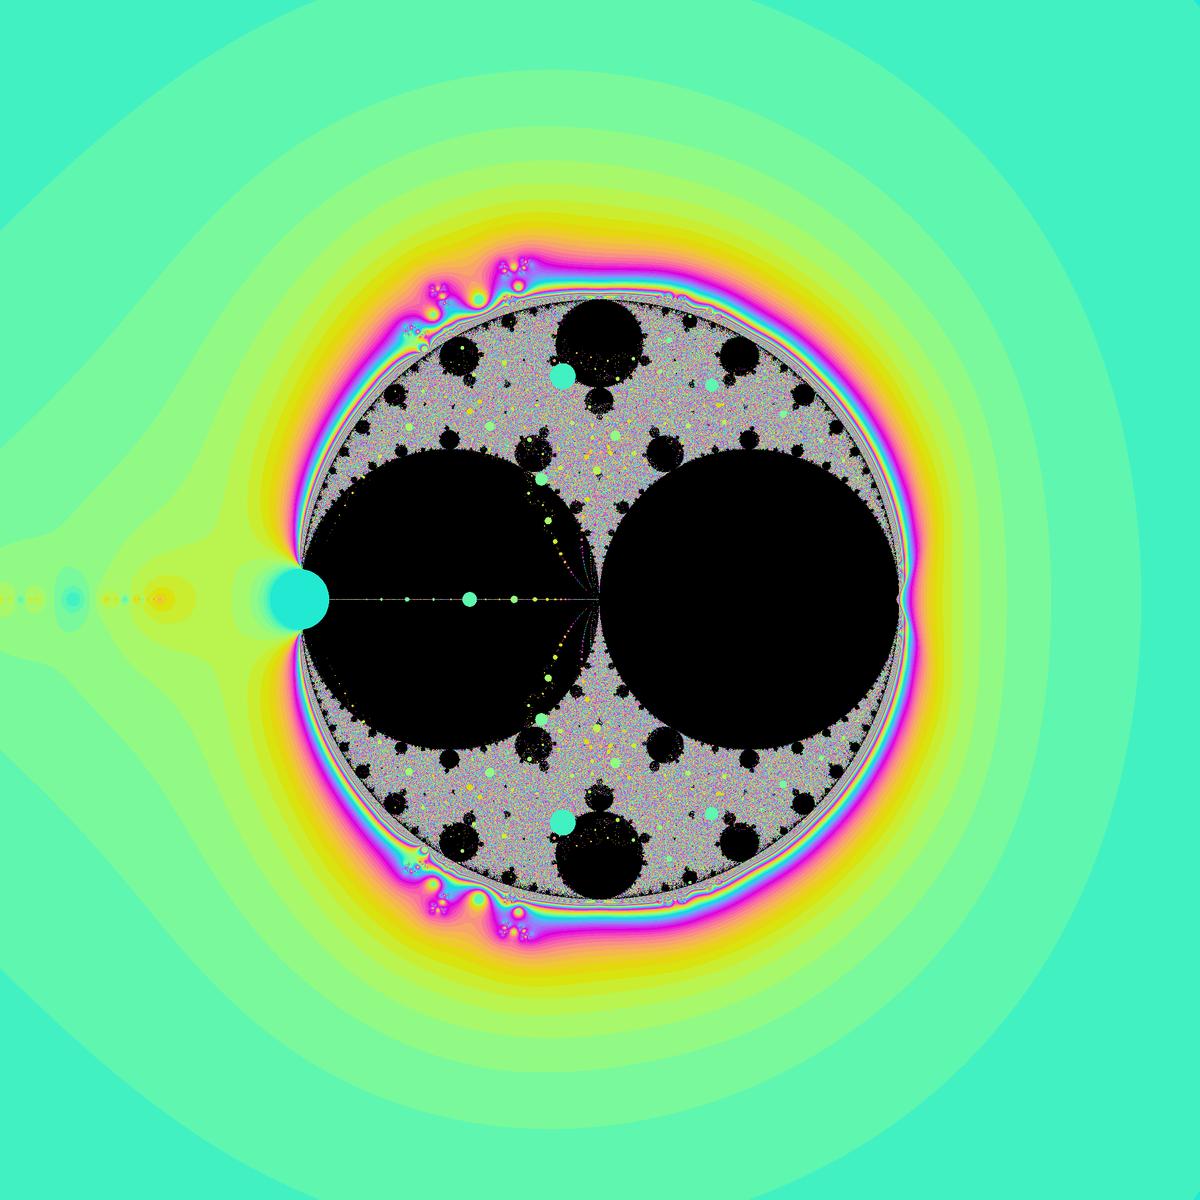 f:id:Hassium277:20210322215758p:plain